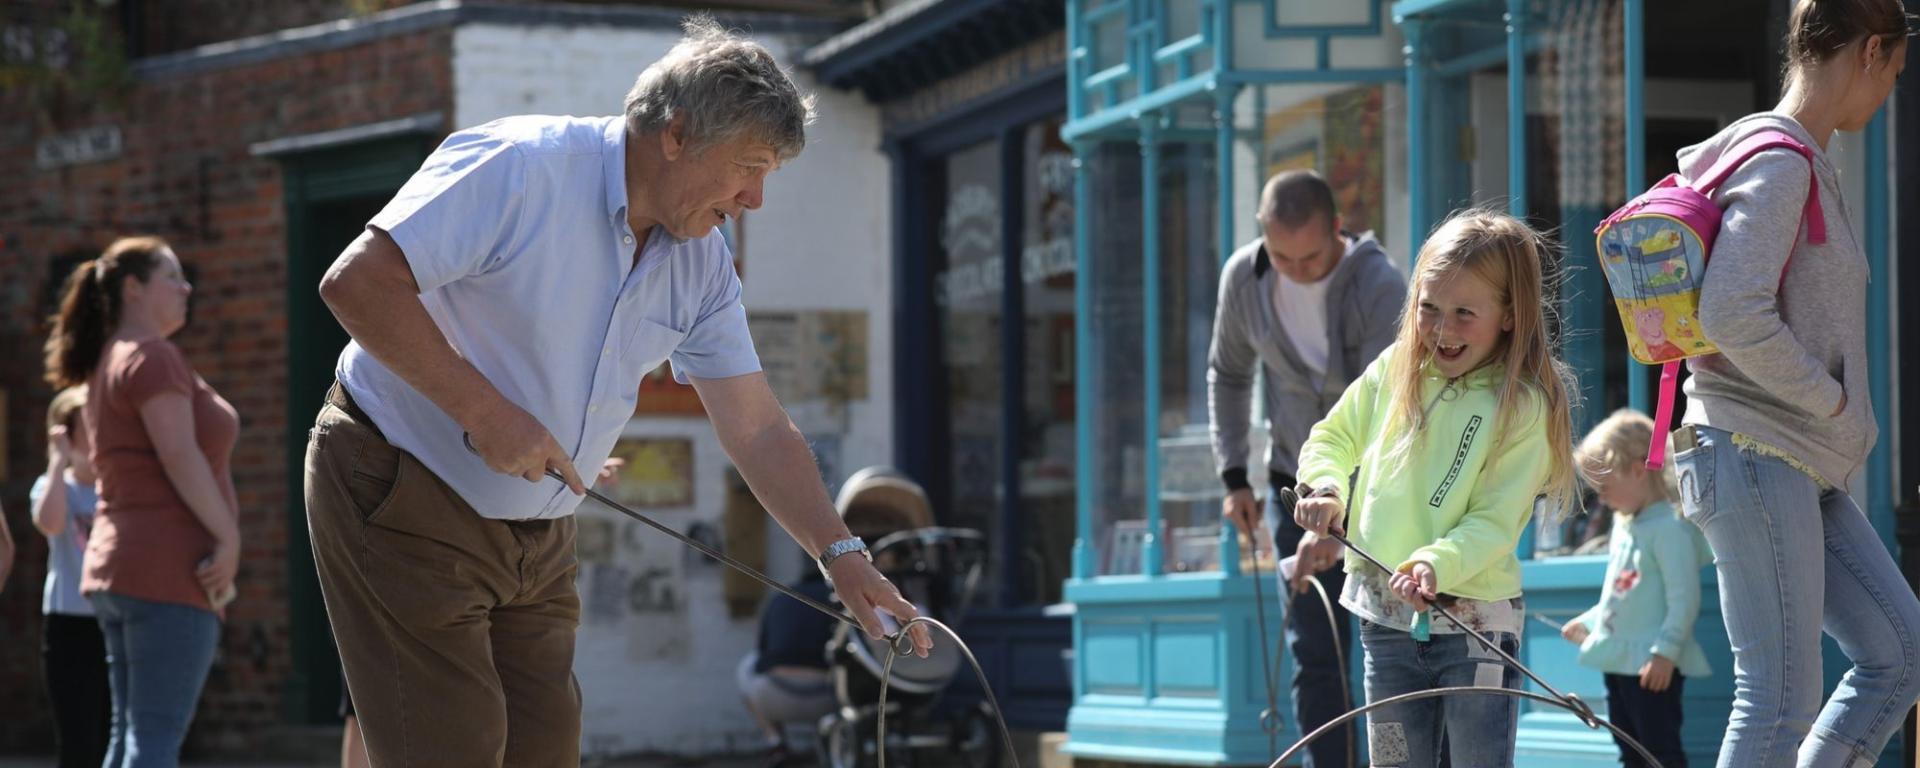 Grandad And Grandchild Playing Hoopla